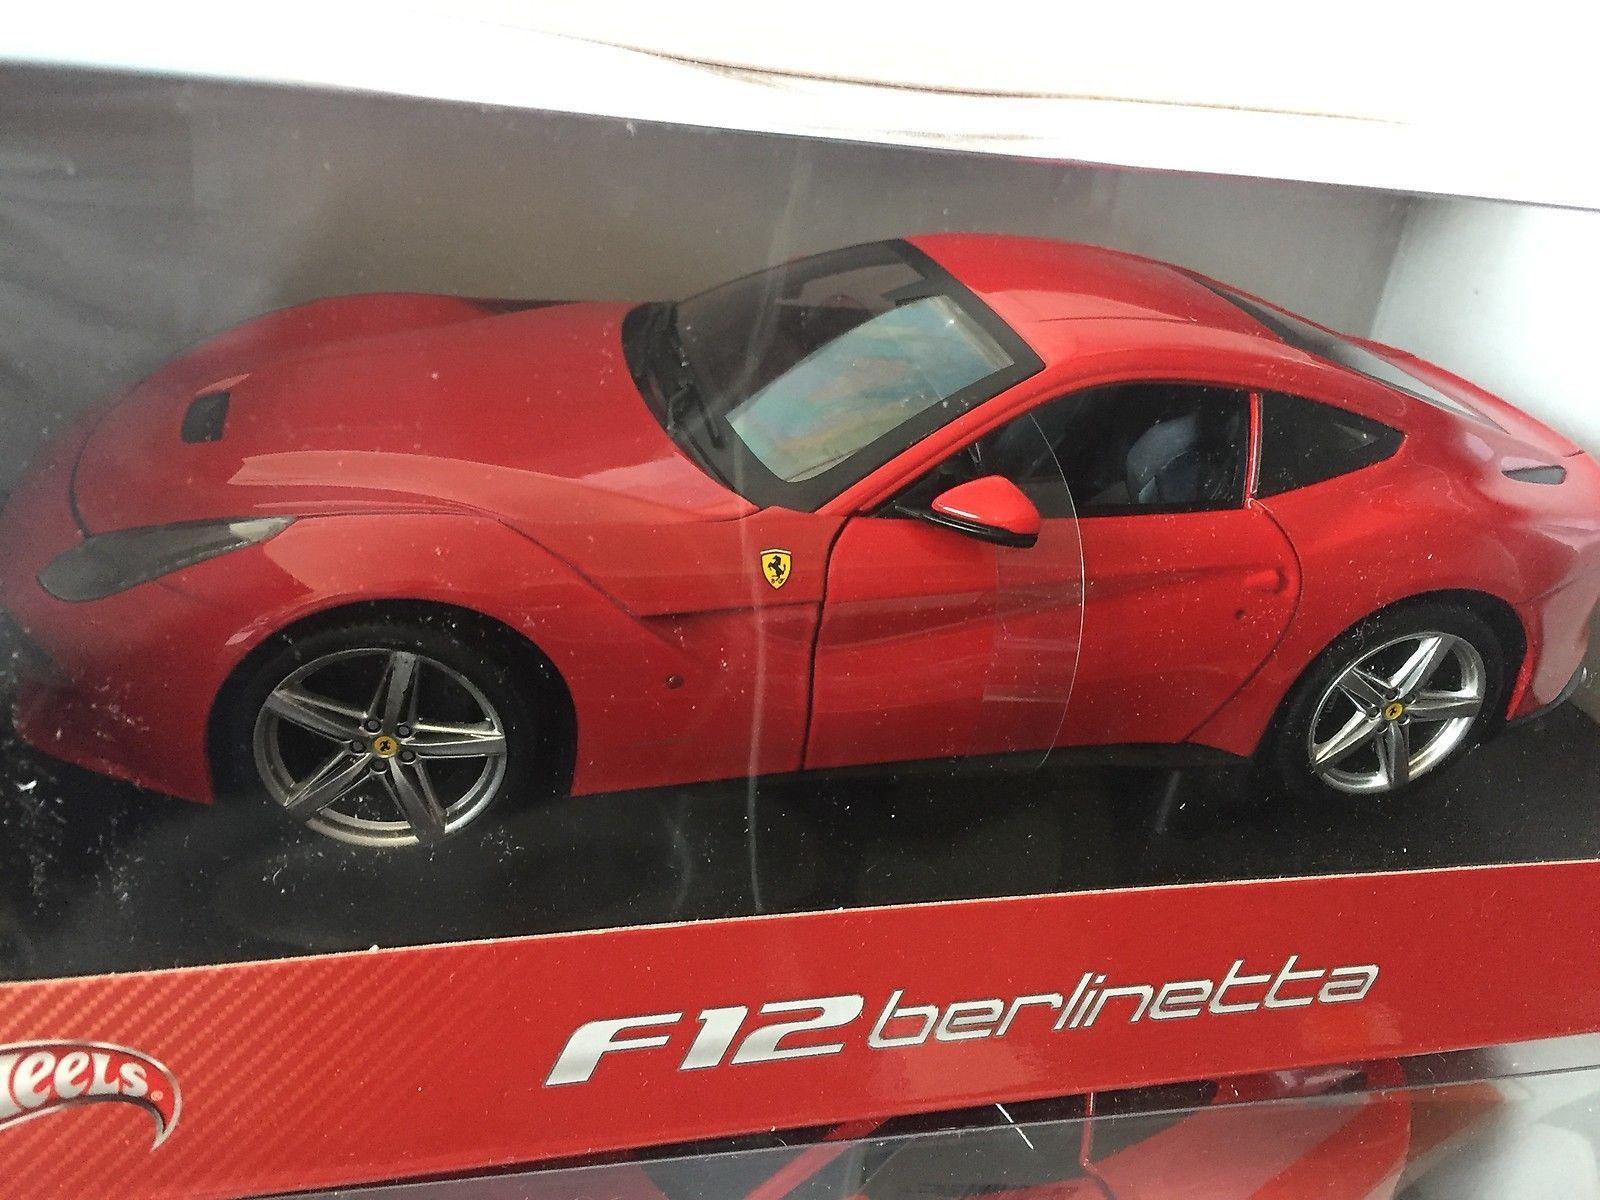 Transformer 304 Ferrari F12 Berlinetta Red Hot Wheels 1 18 Hot Wheels Ferrari F12 Red Hot